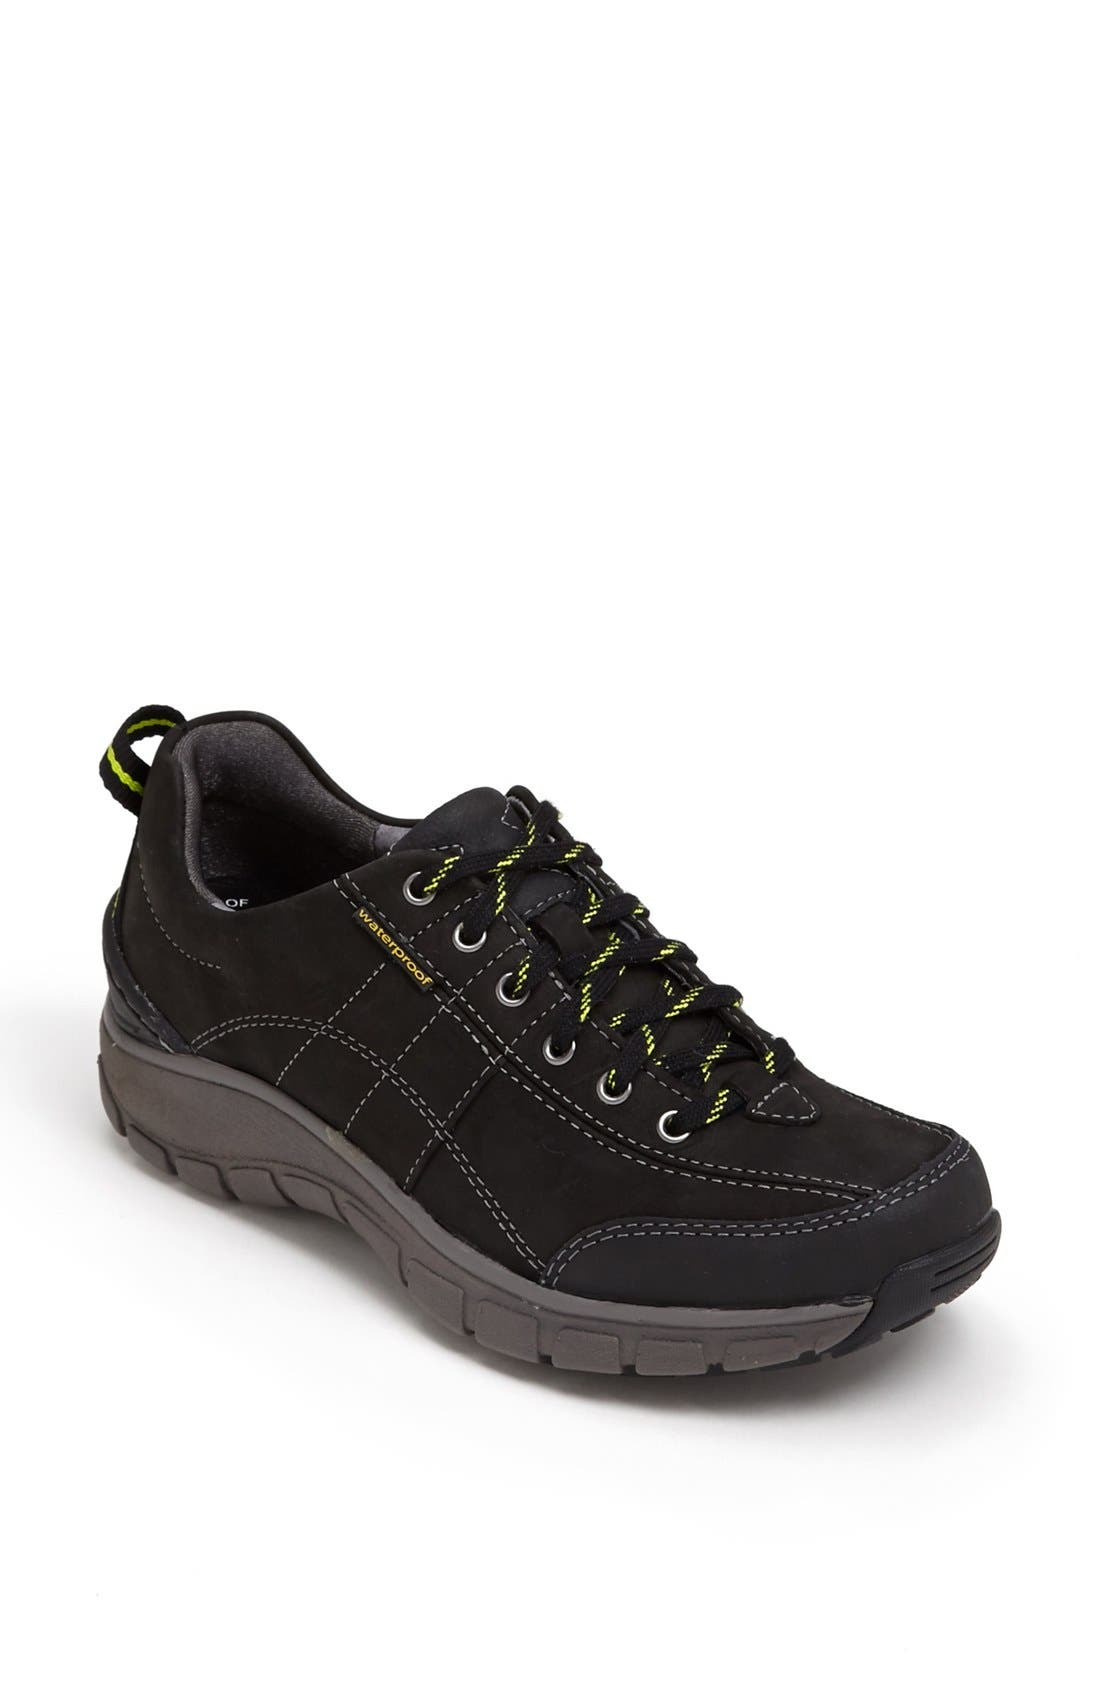 'Wave Trek' Waterproof Sneaker,                             Main thumbnail 1, color,                             005